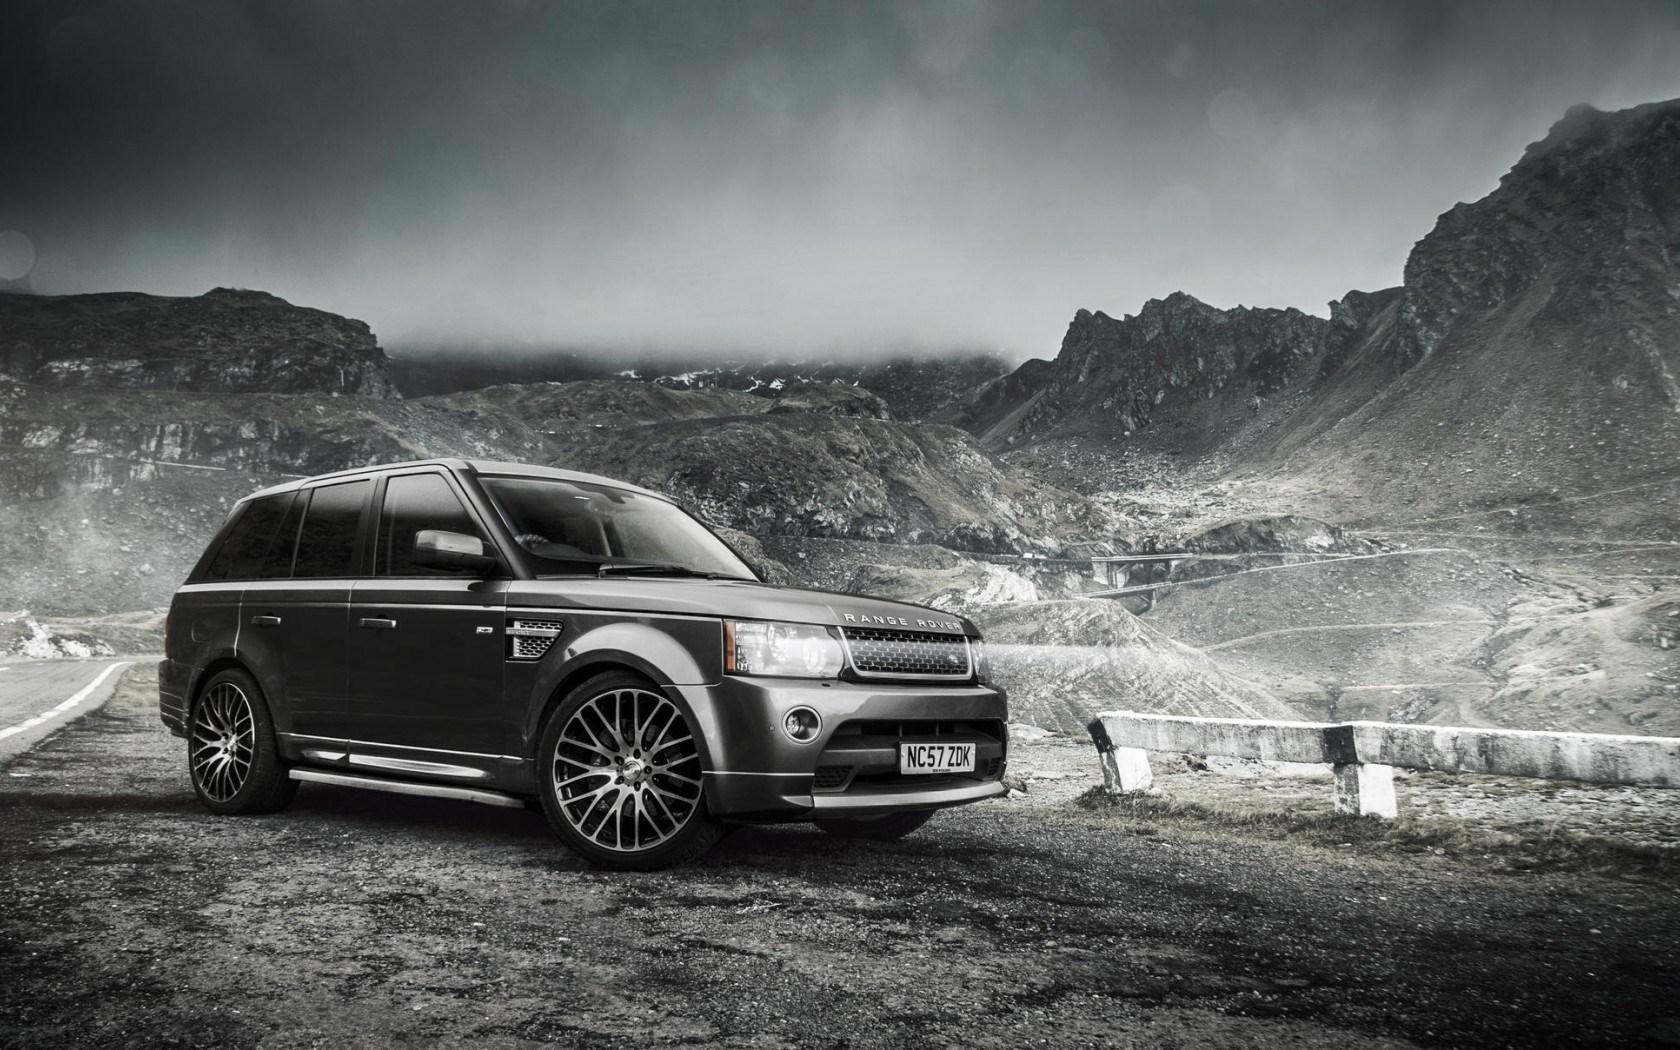 Range Rover Sport Black Wallpaper: Range Rover Sport 2015 Desktop Wallpapers 1600x1200